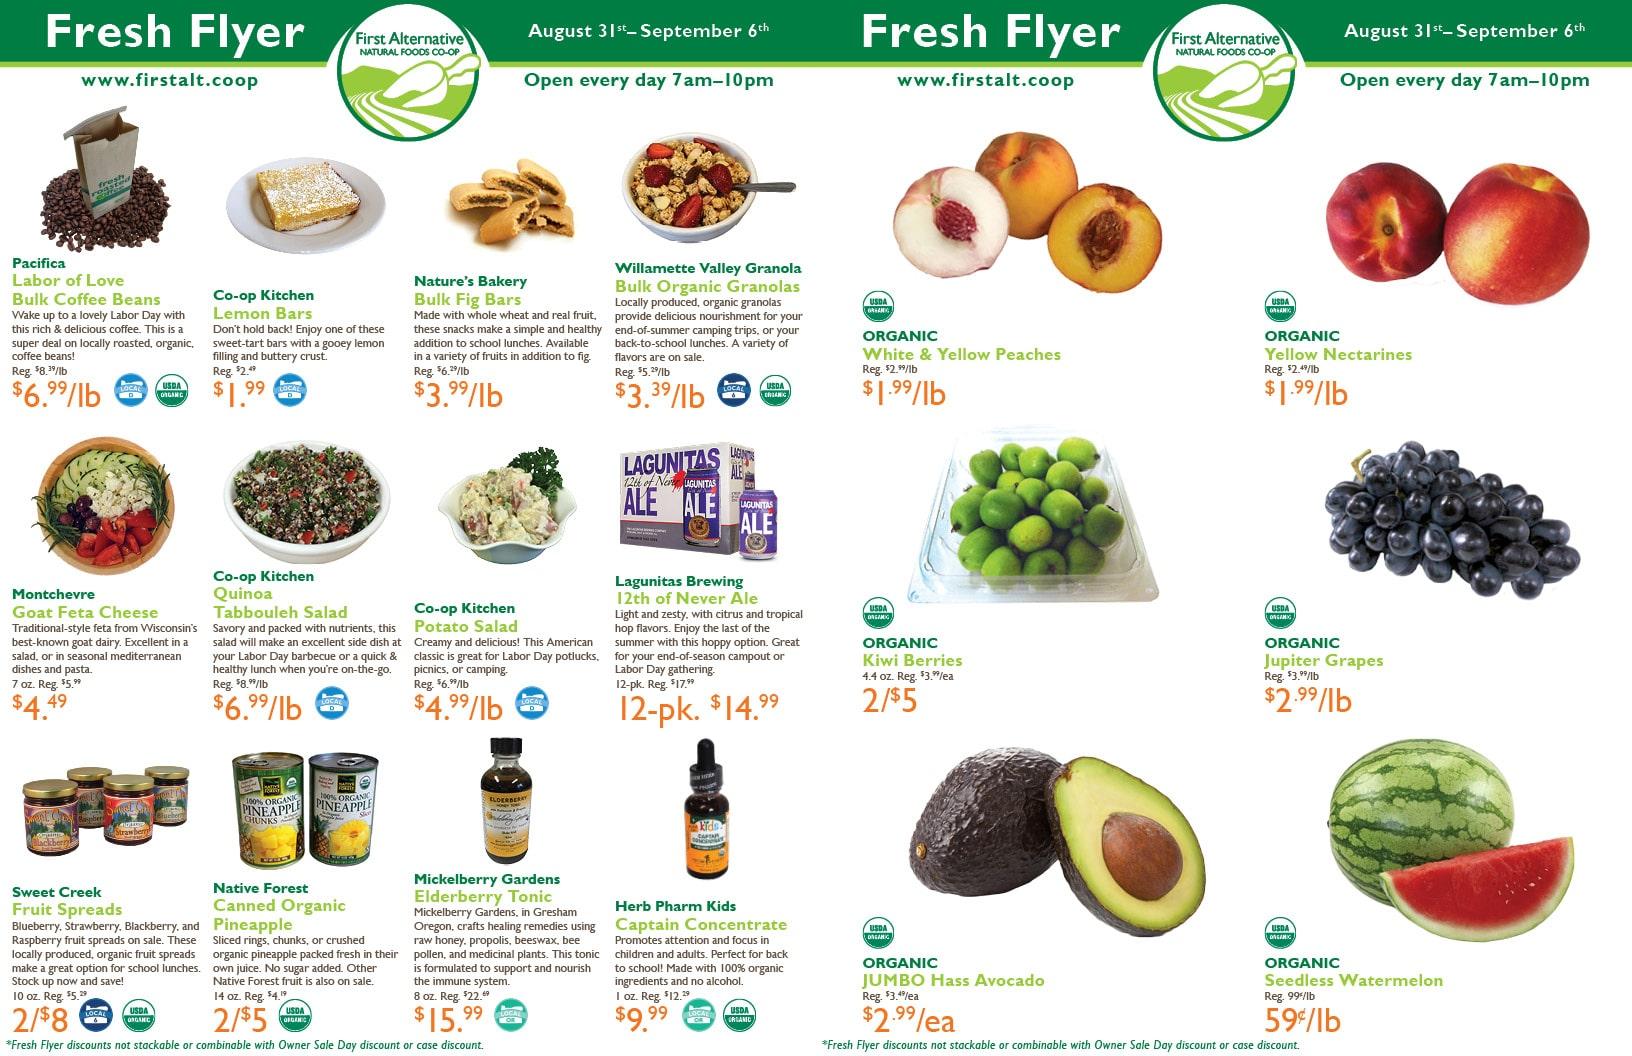 First Alternative Fresh Flyer Aug 31-Sept 6